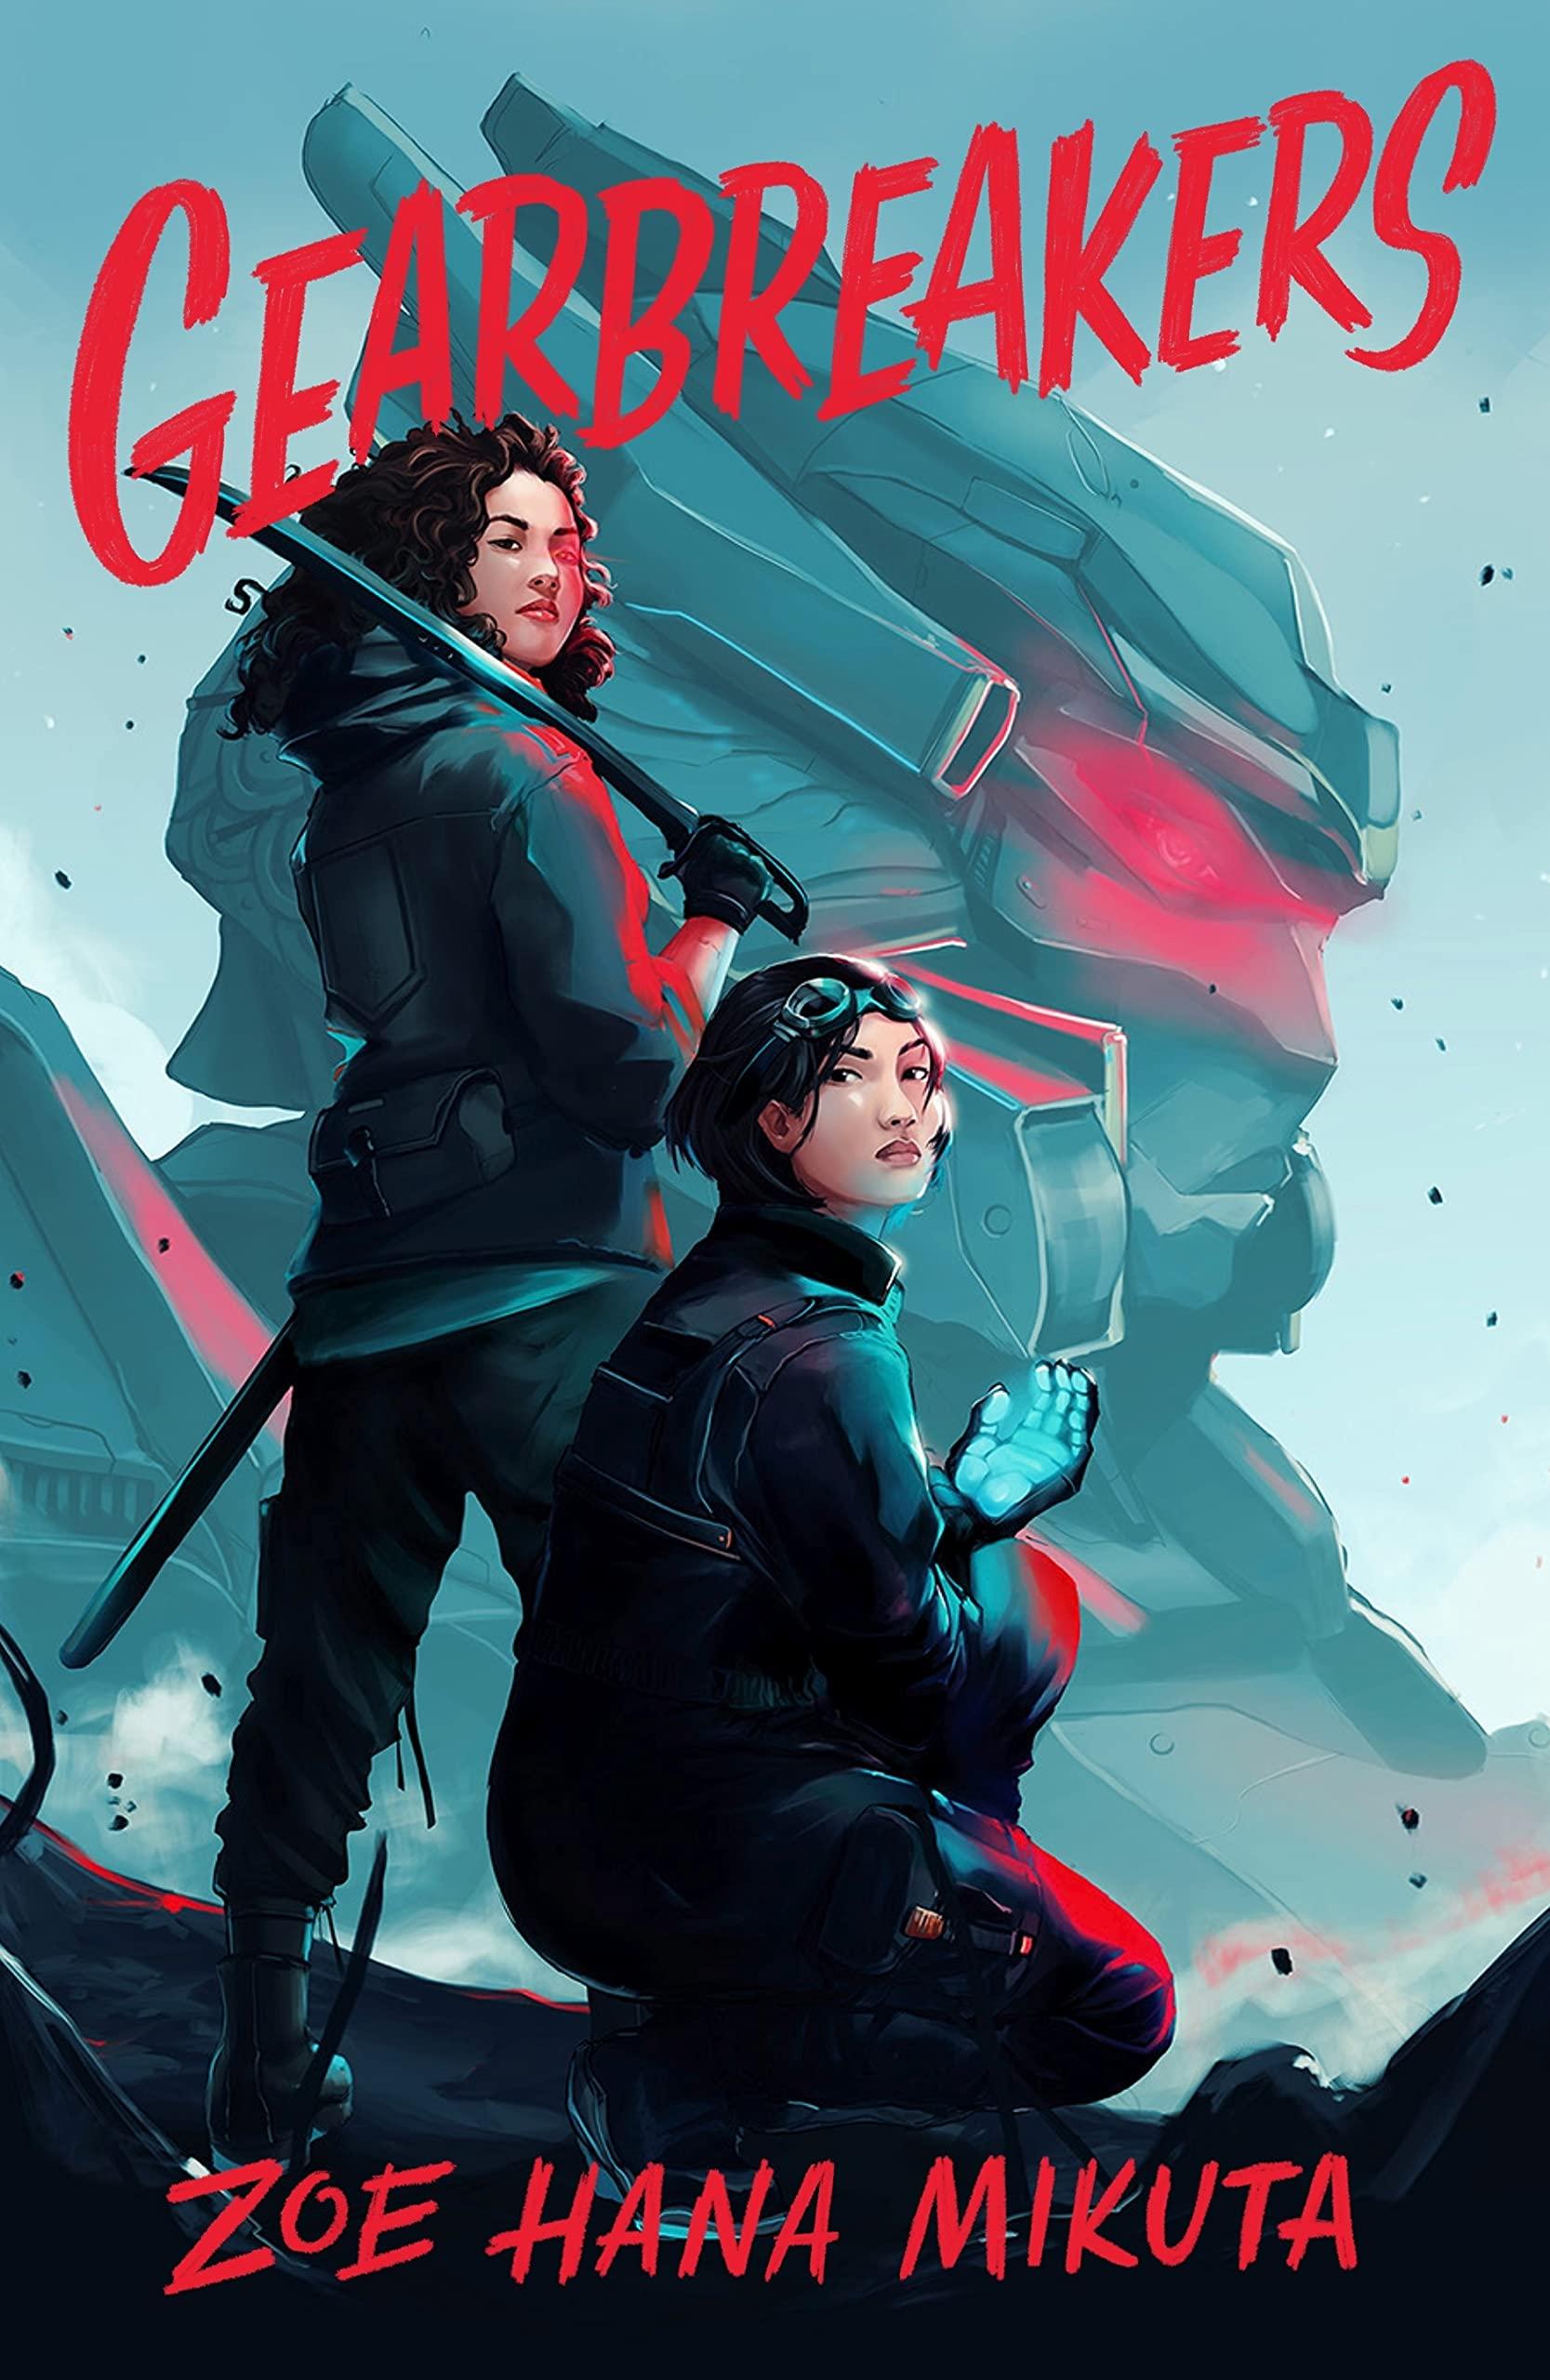 Amazon.com: Gearbreakers (Gearbreakers, 1) (9781250269508): Mikuta, Zoe Hana:  Books